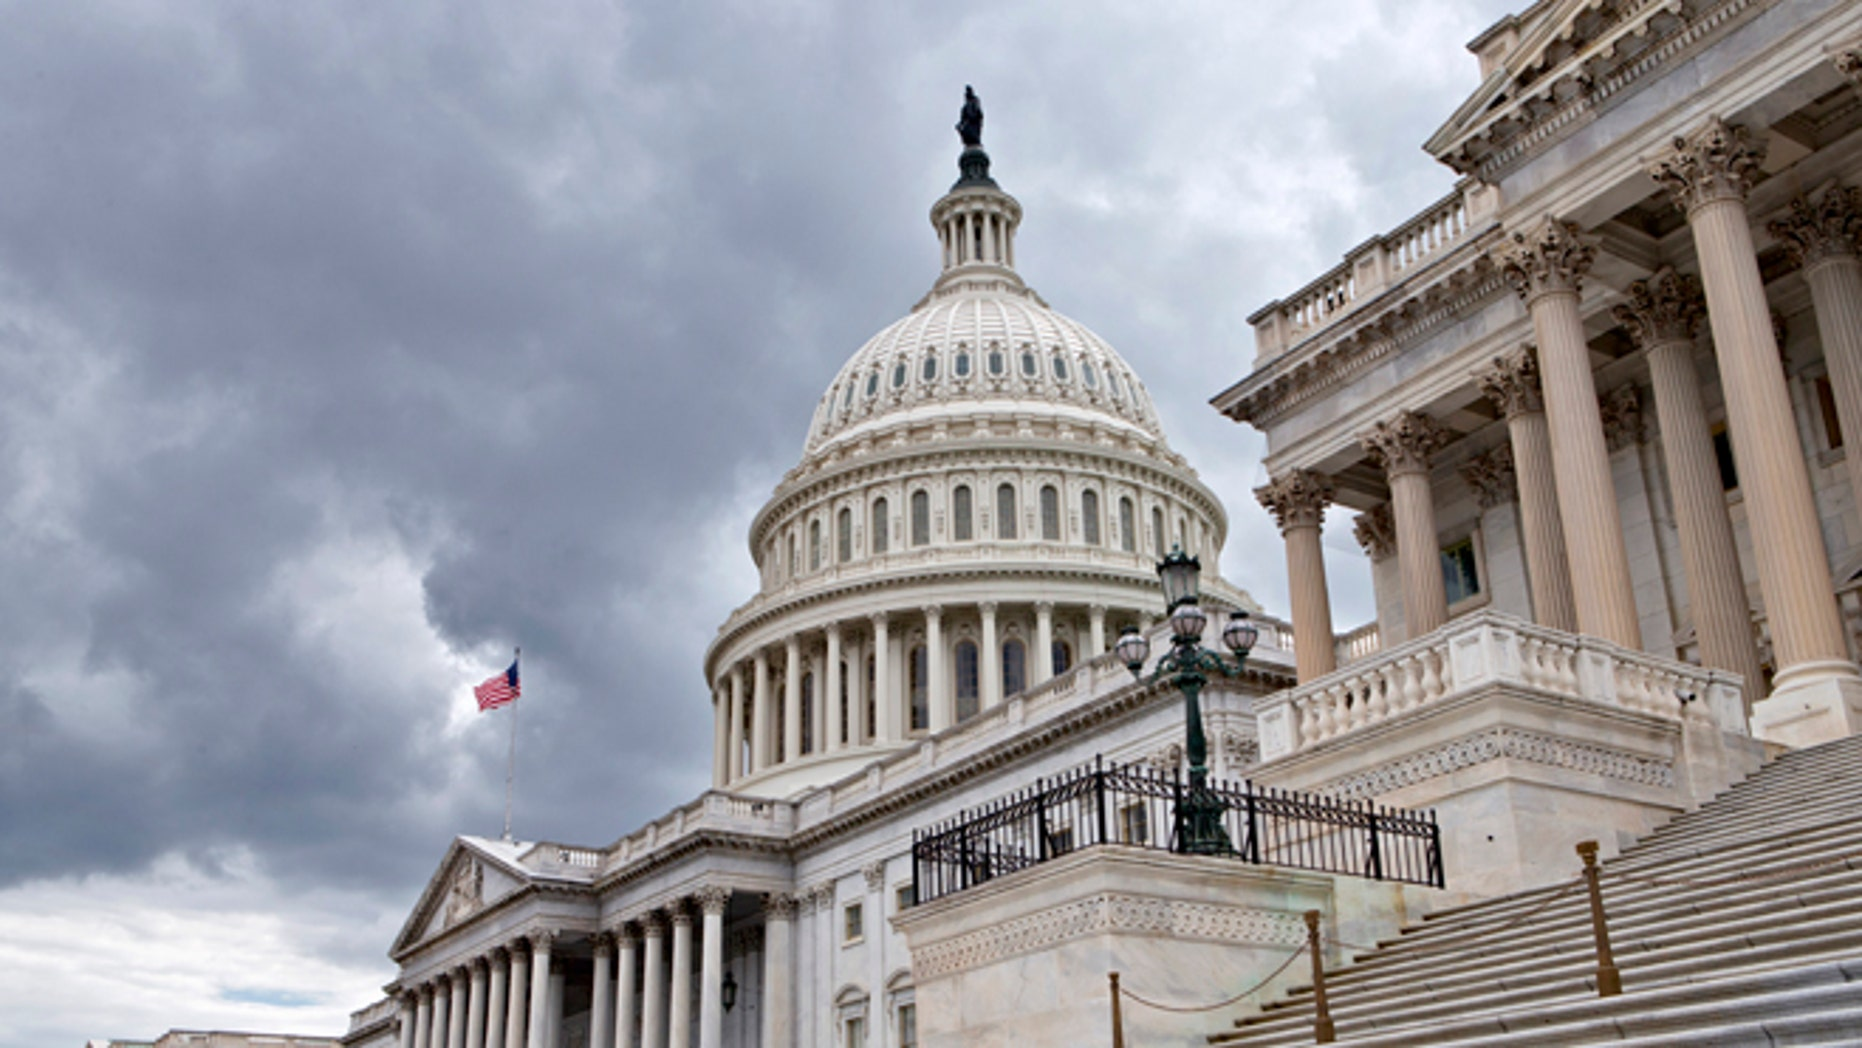 FILE: July 23, 2013: U.S. Capitol in Washington, D.C.